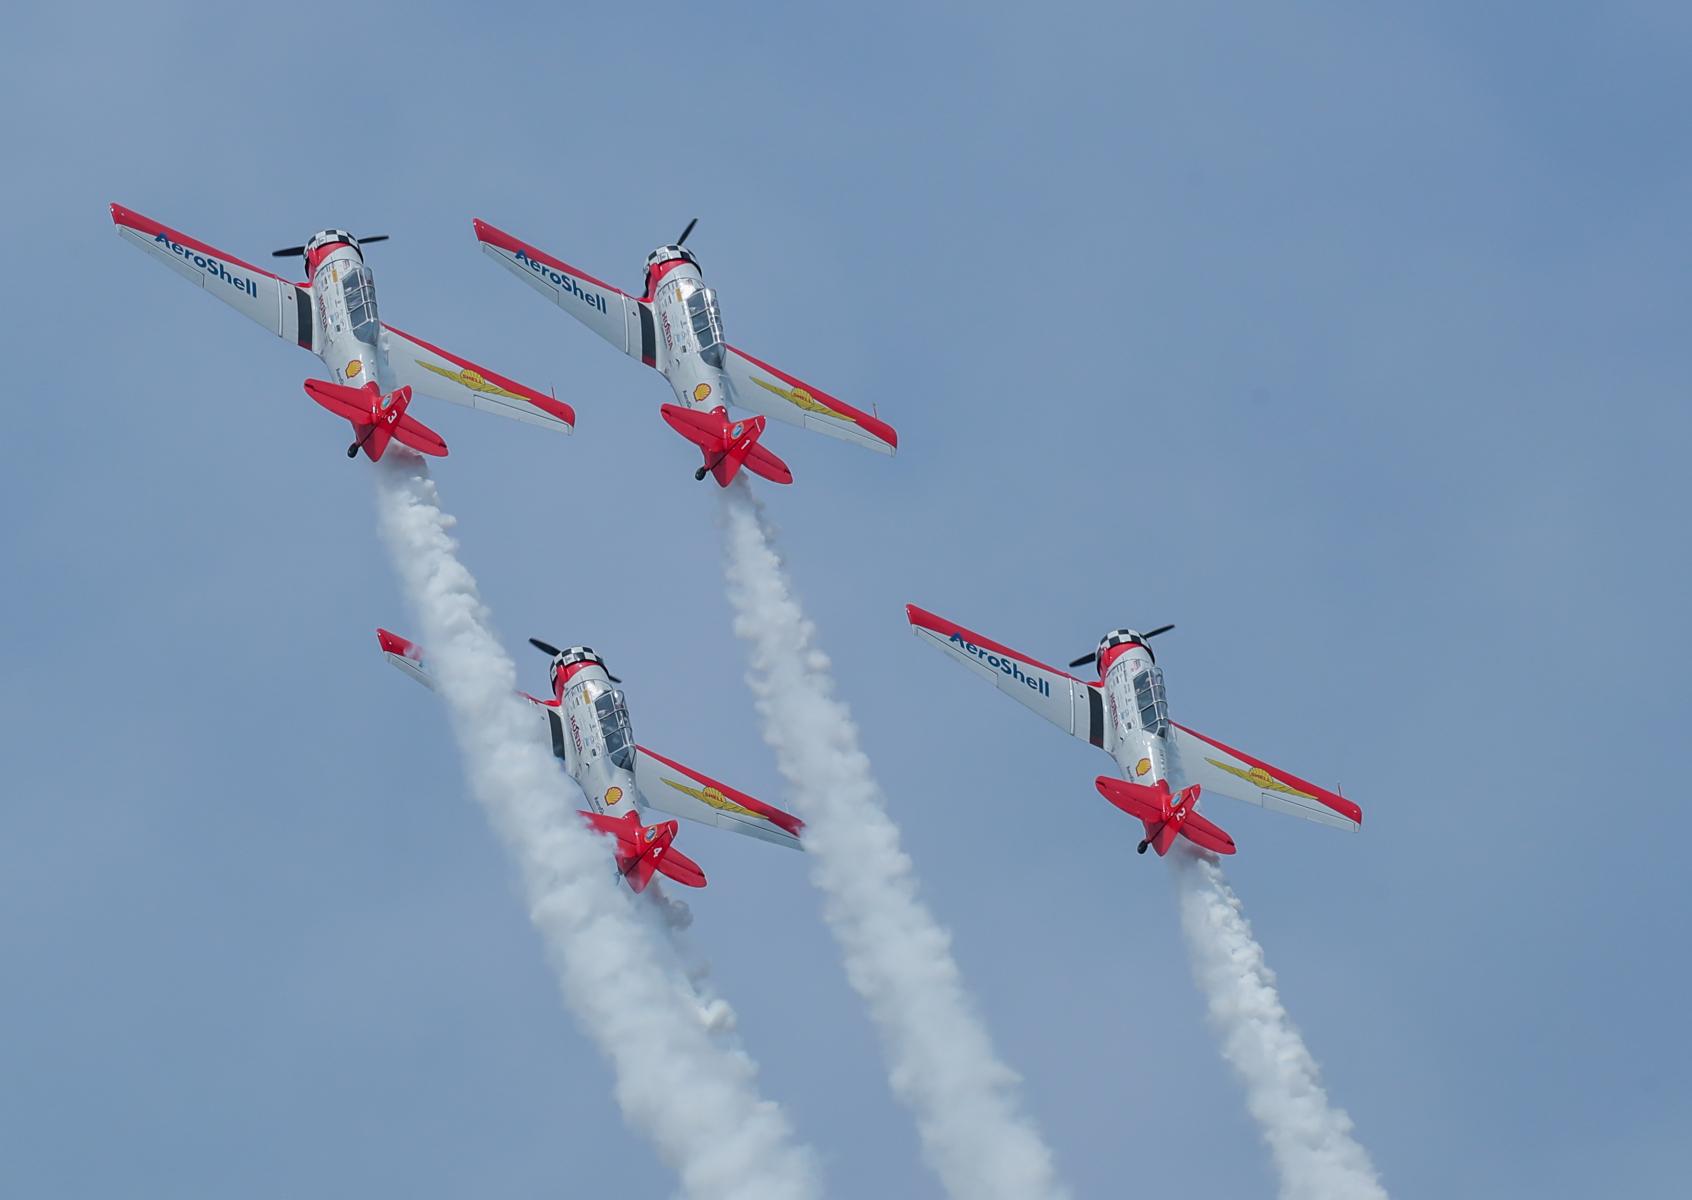 AeroShell Texans by Art Eichmann